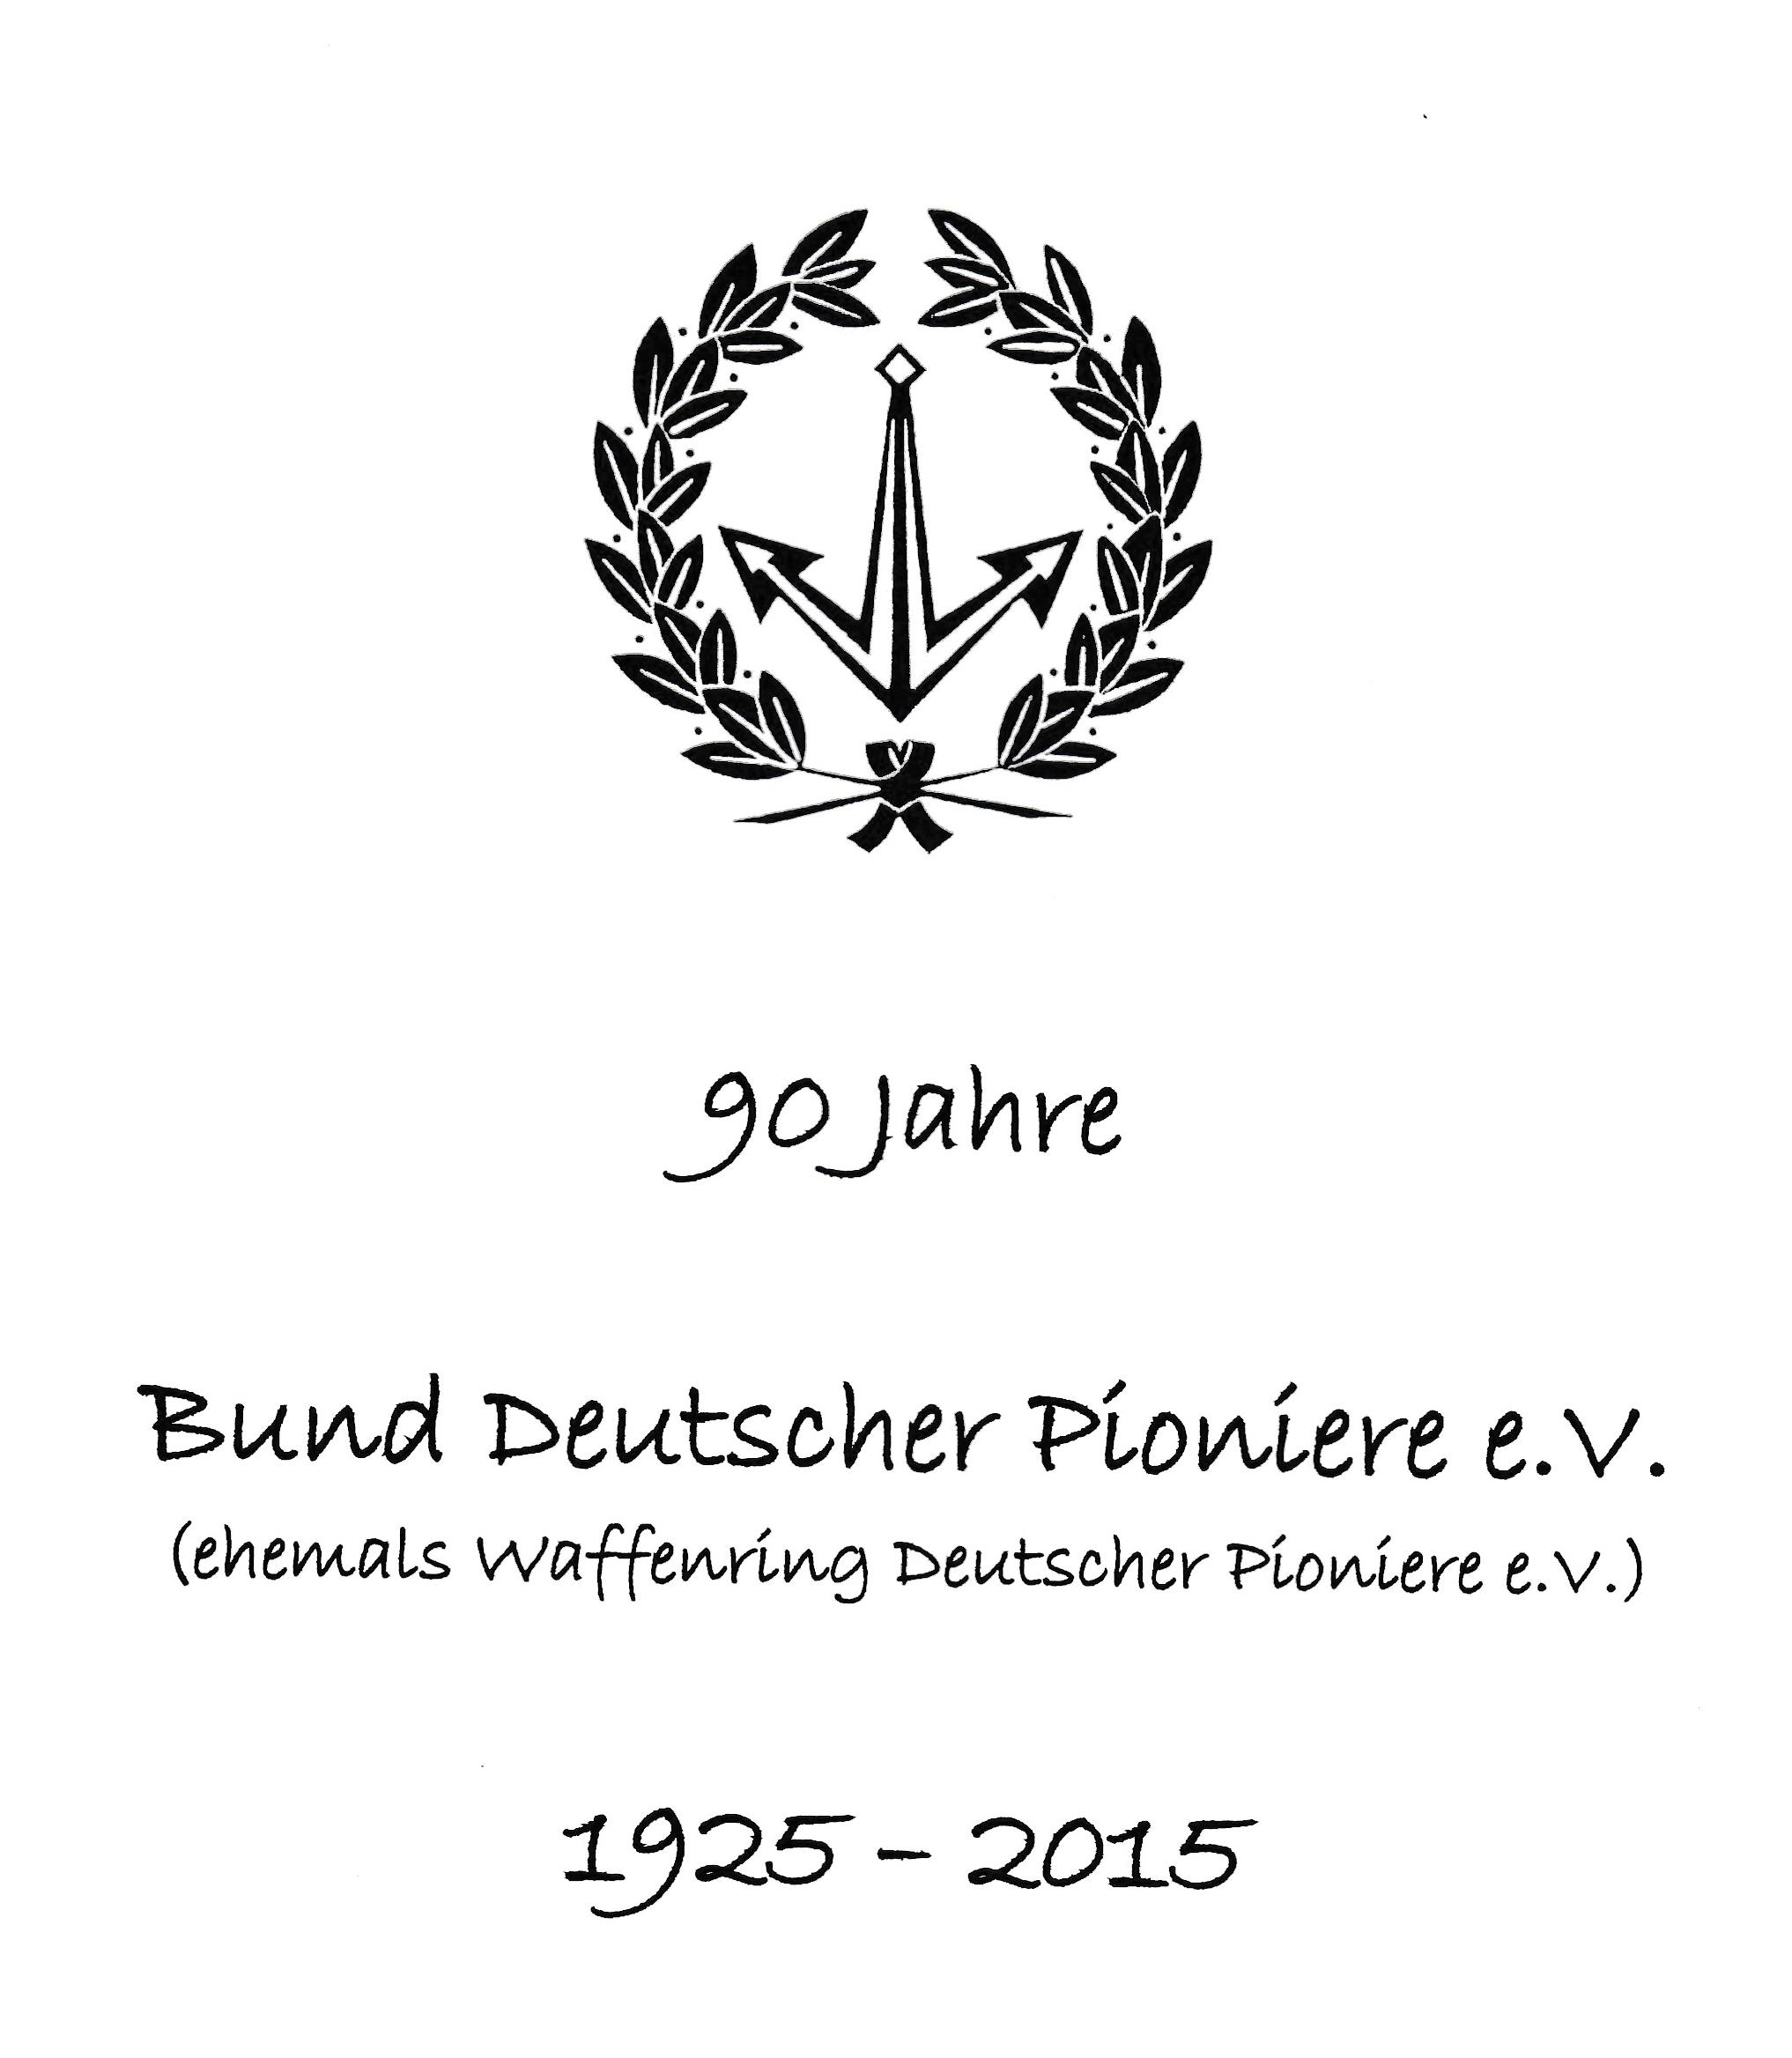 90 Jahr BDPi